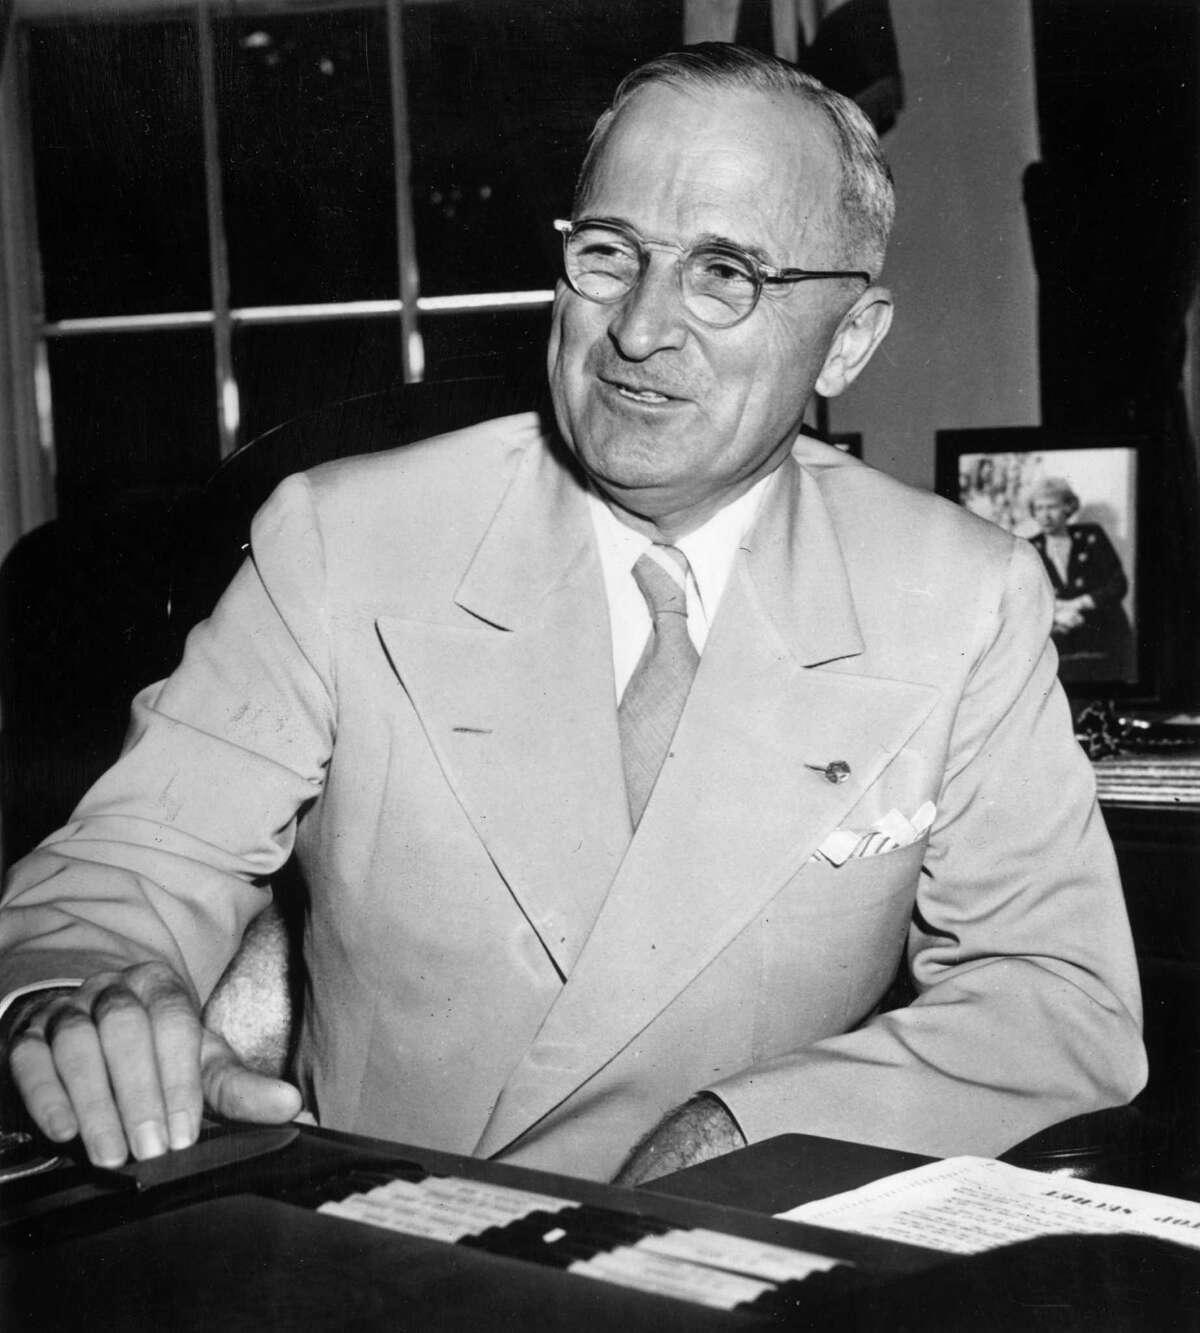 Harry Truman High: 87 percent, June 1945 Low: 22 percent, February 1952